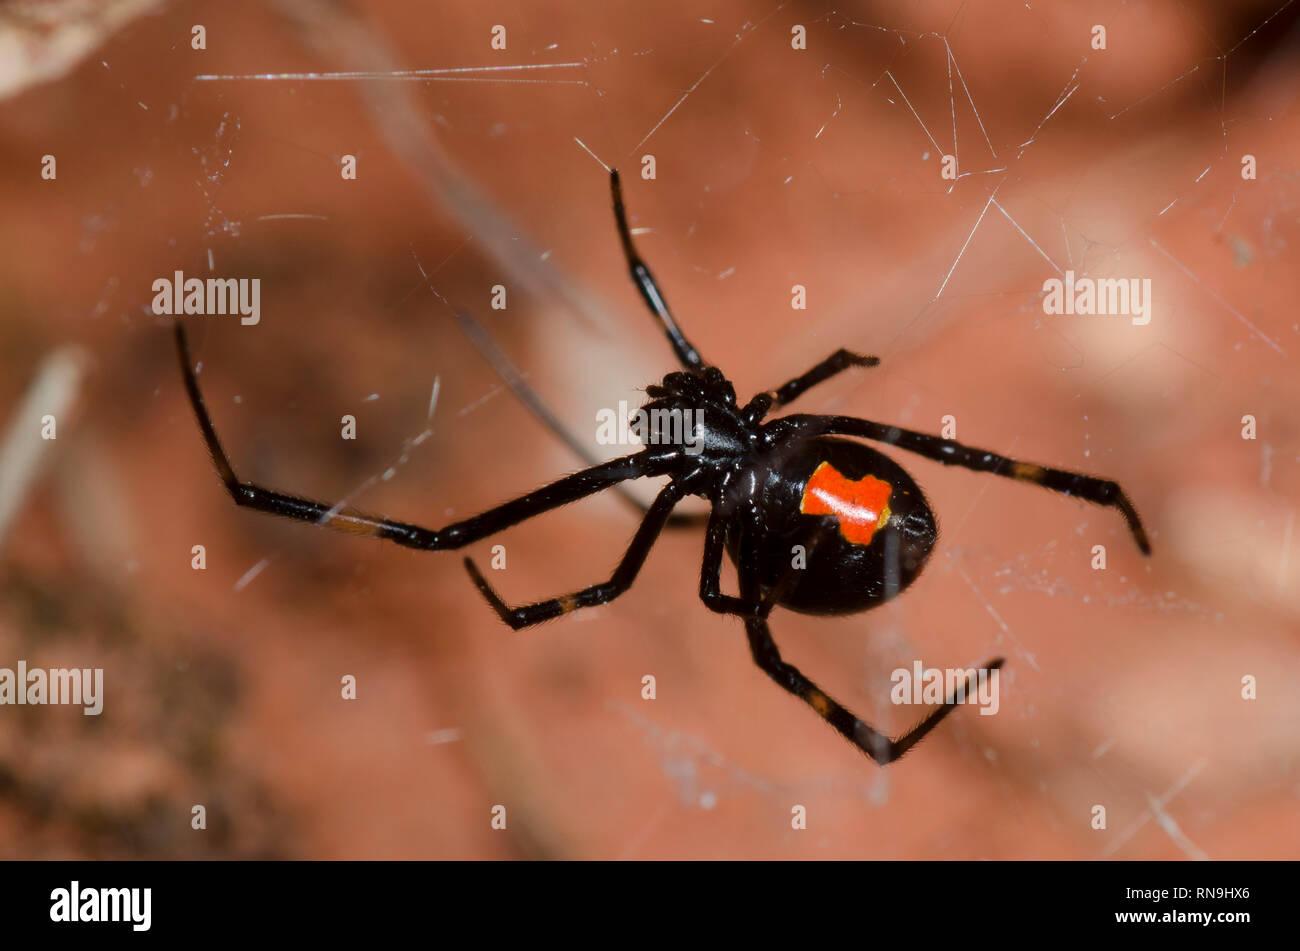 Southern Black Widow, Latrodectus mactans - Stock Image